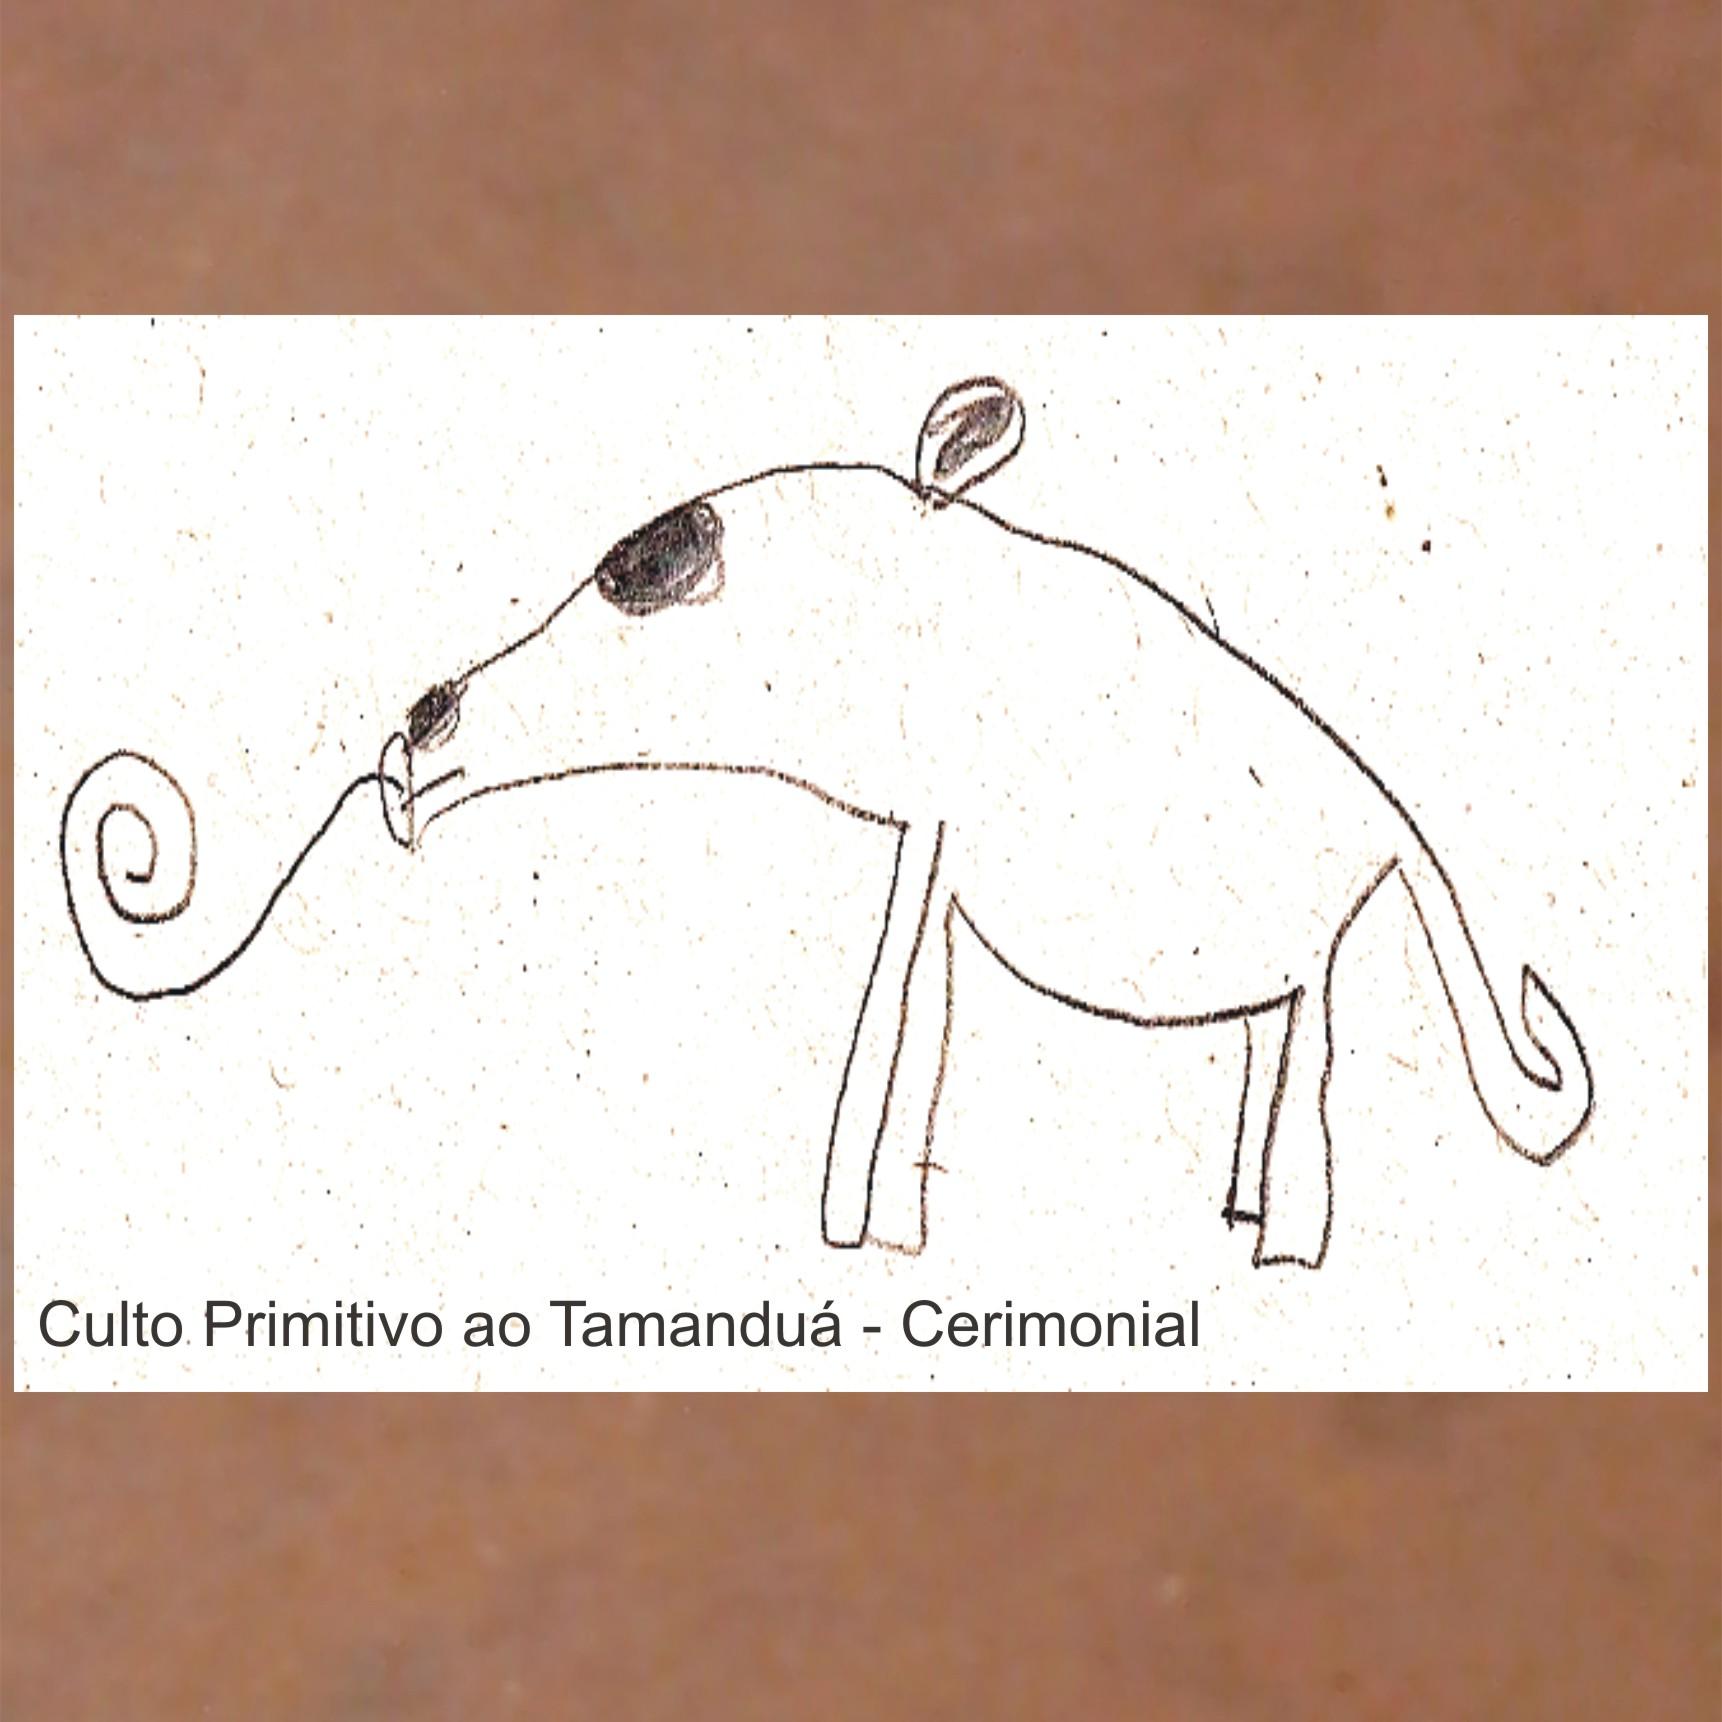 MSRCD024 - Culto Primitivo ao Tamanduá - Cerimonial